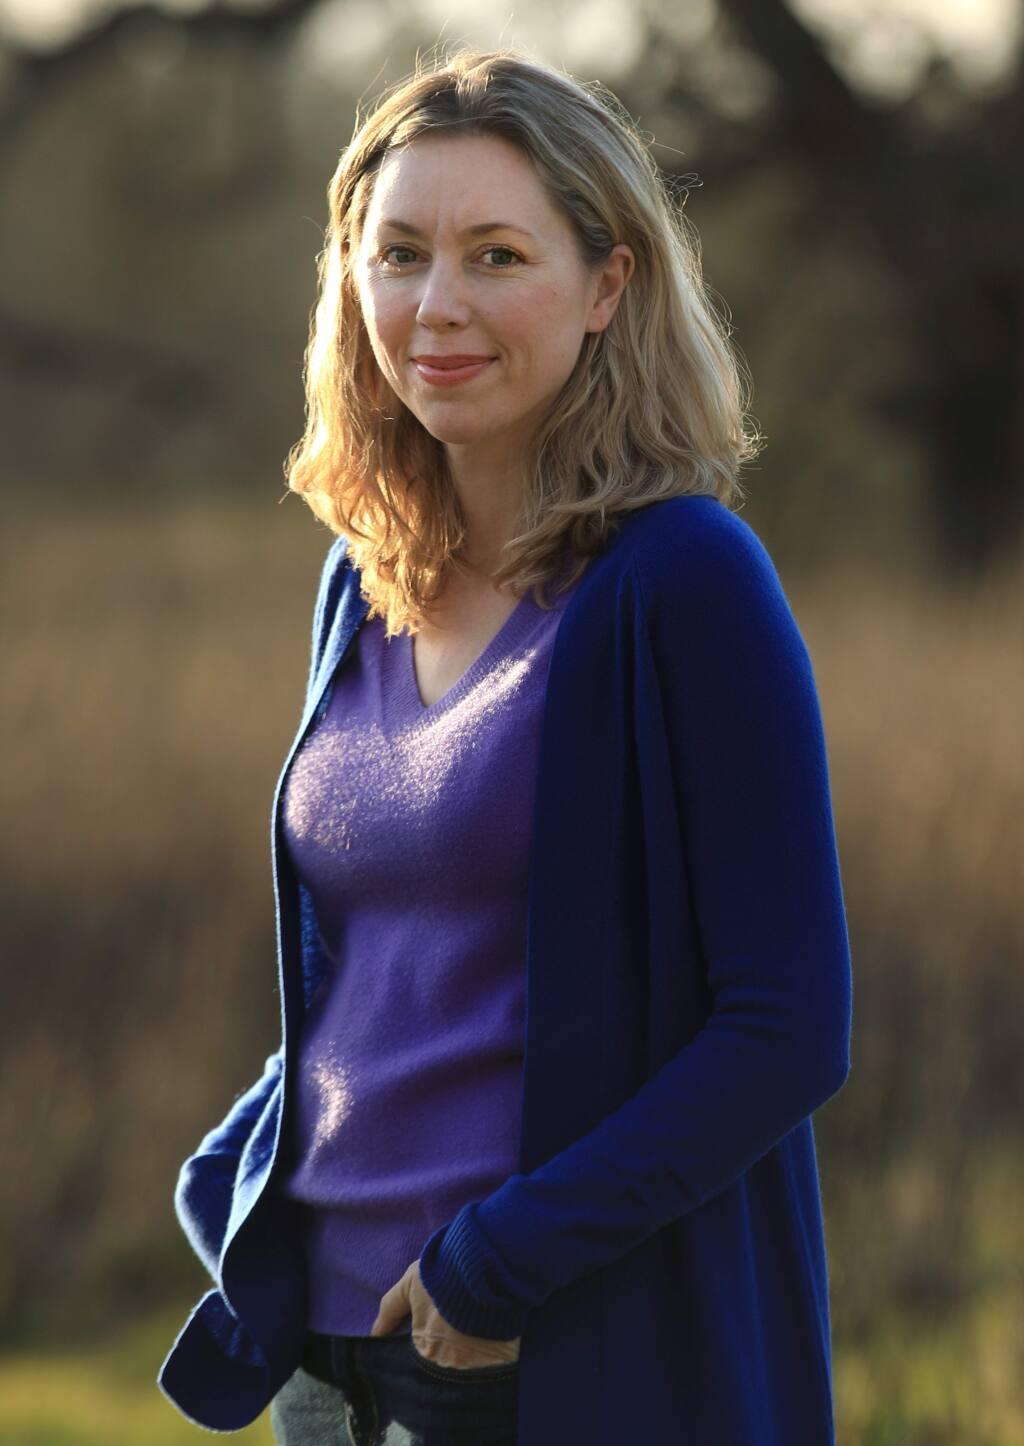 Lynda Hopkins Sonoma County 5th District Supervisor, Thursday, Feb. 13, 2020. (Kent Porter / The Press Democrat) 2020